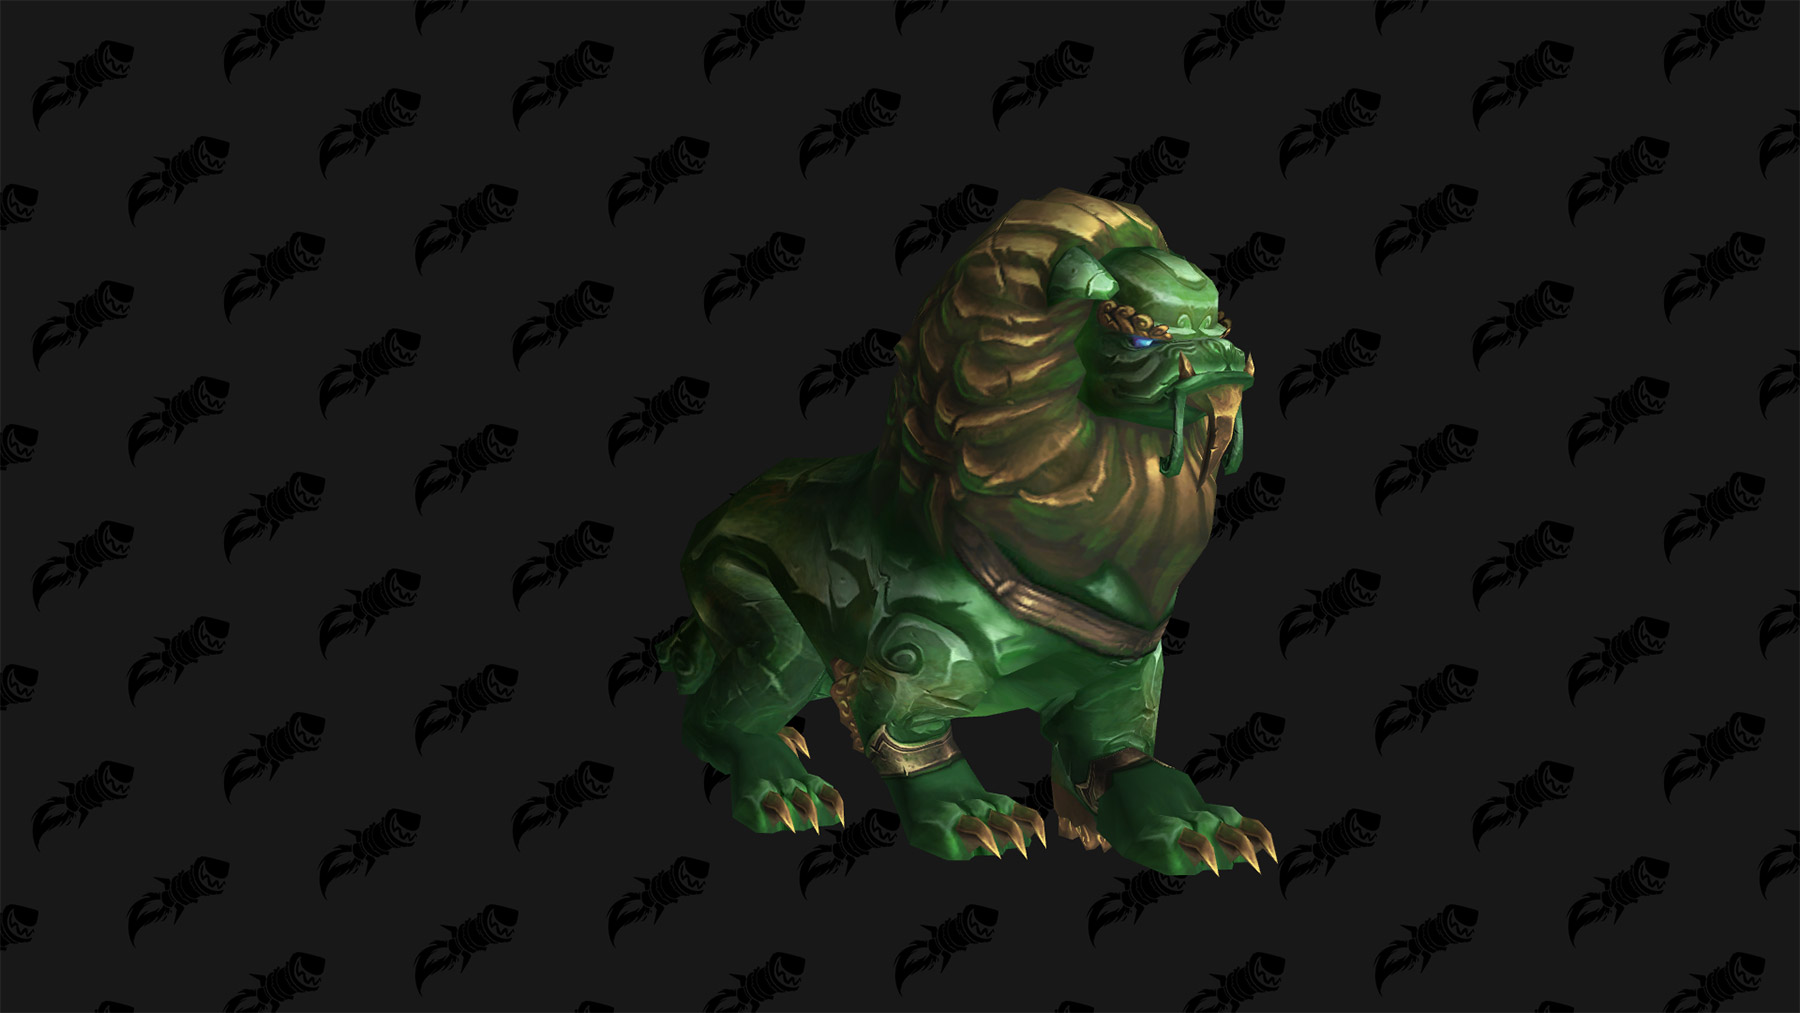 Mascotte Défenseur de jade